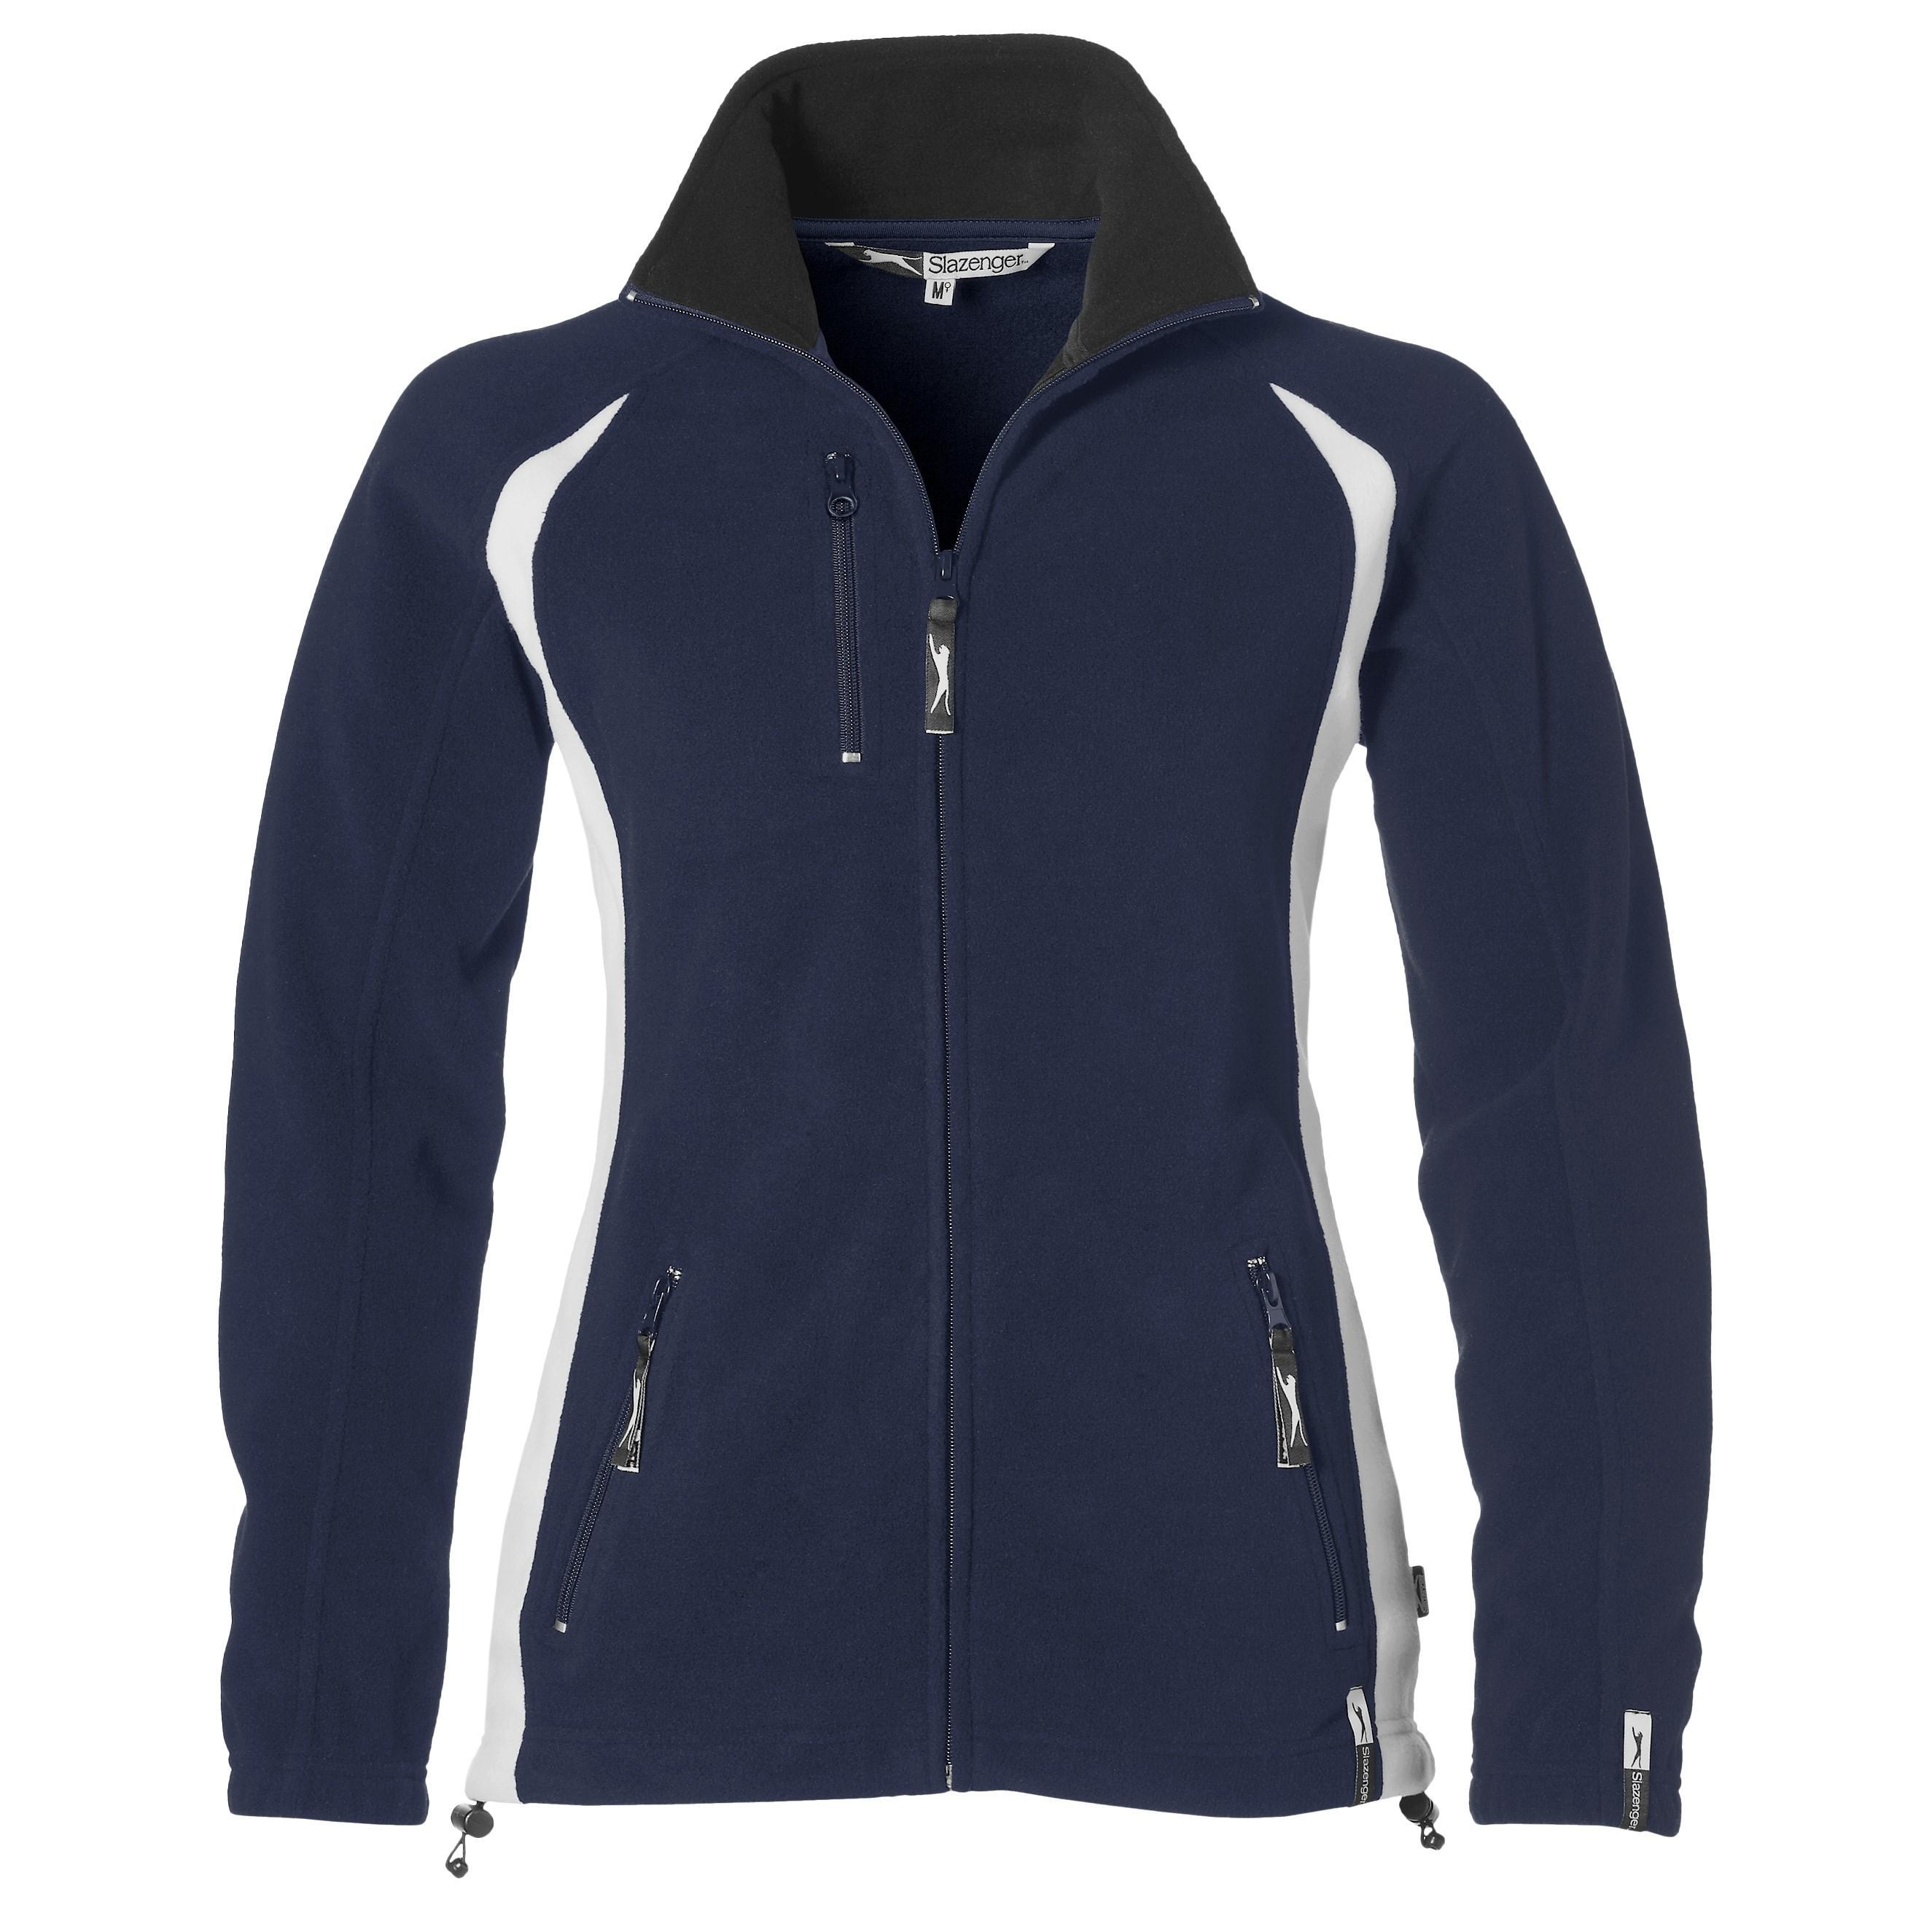 Ladies Apex Micro Fleece Jacket - Navy Only